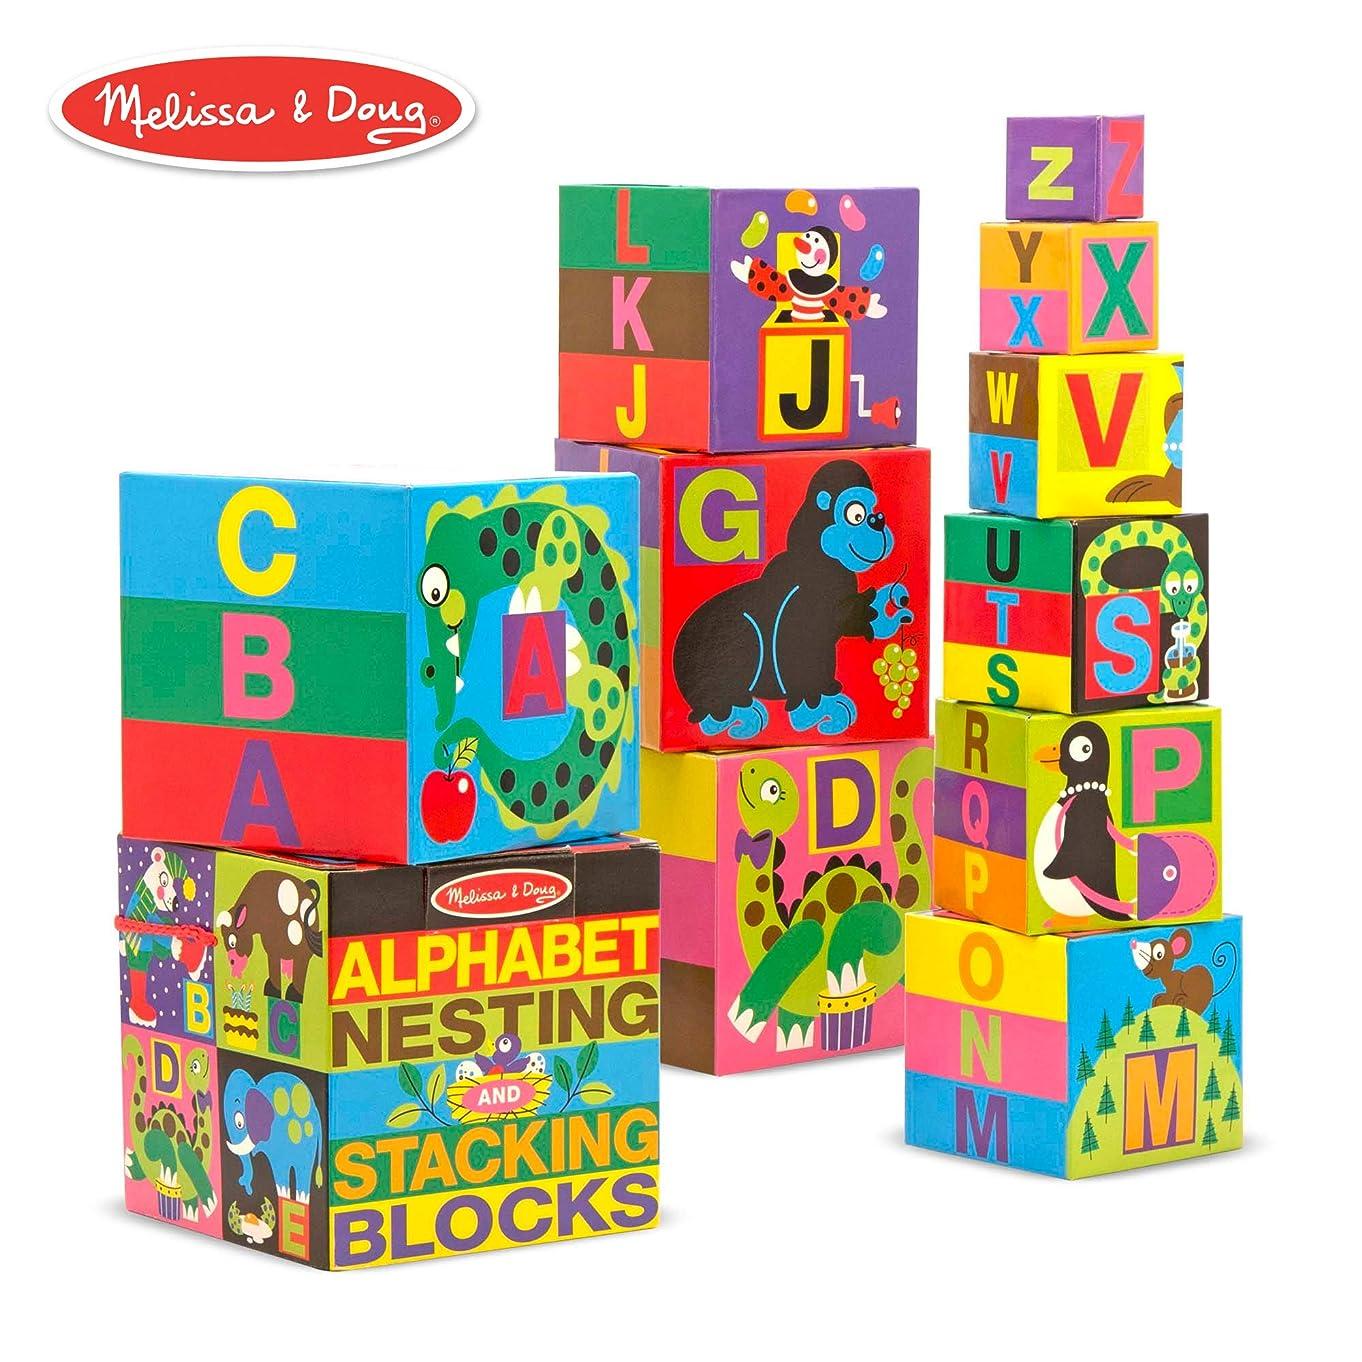 Melissa & Doug Alphabet Nesting and Stacking Blocks (Developmental Toys, Easy Storage, Durable Construction, 10 Cardboard Nesting Boxes)